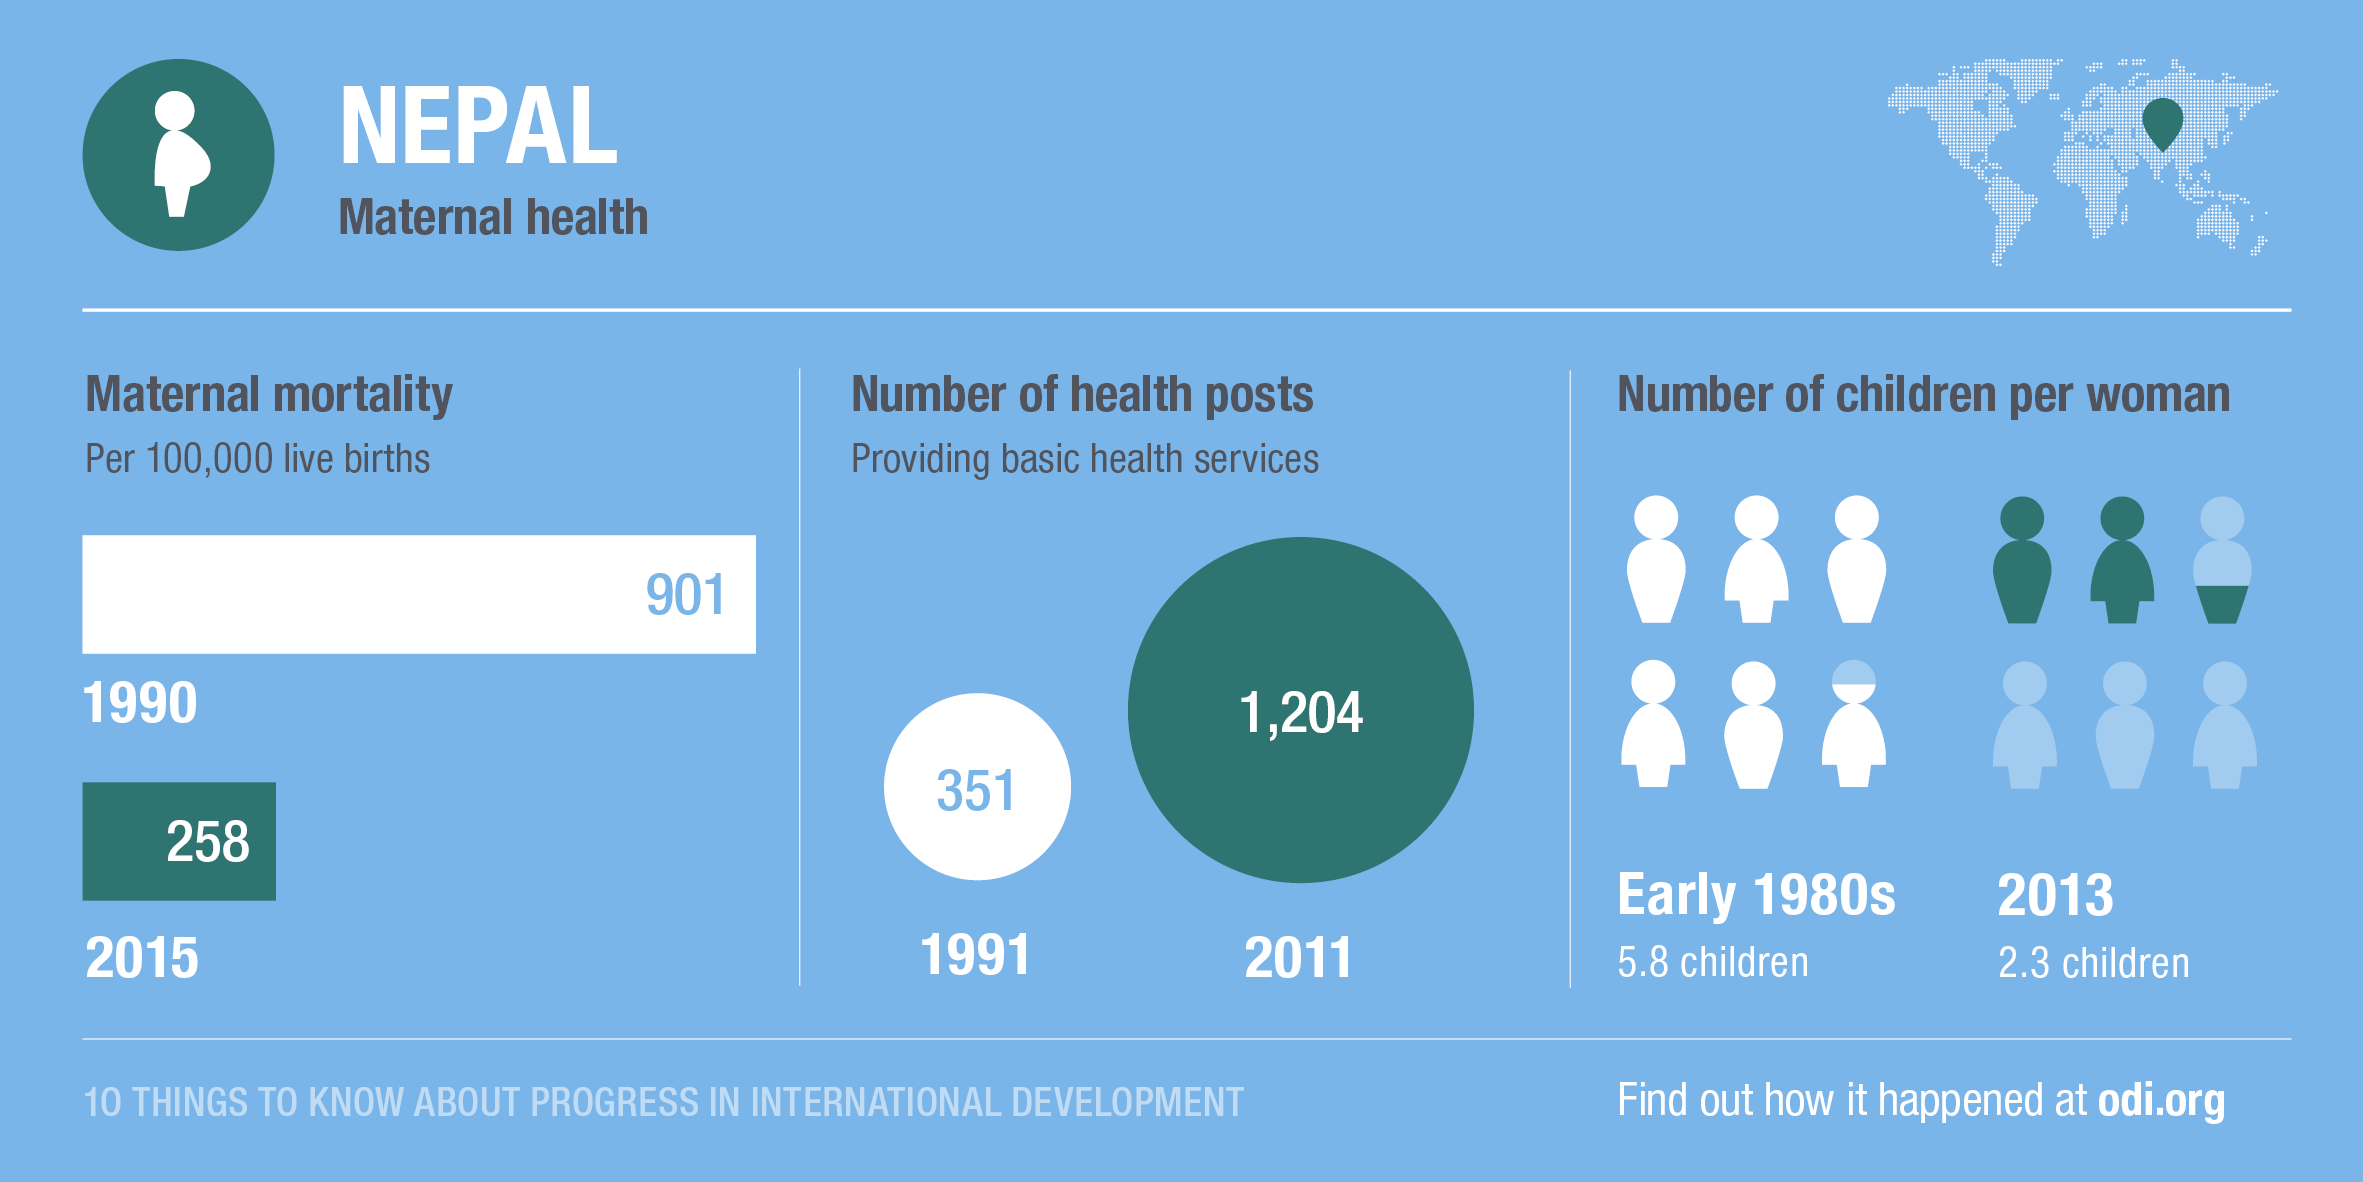 Nepal's progress on maternal mortality